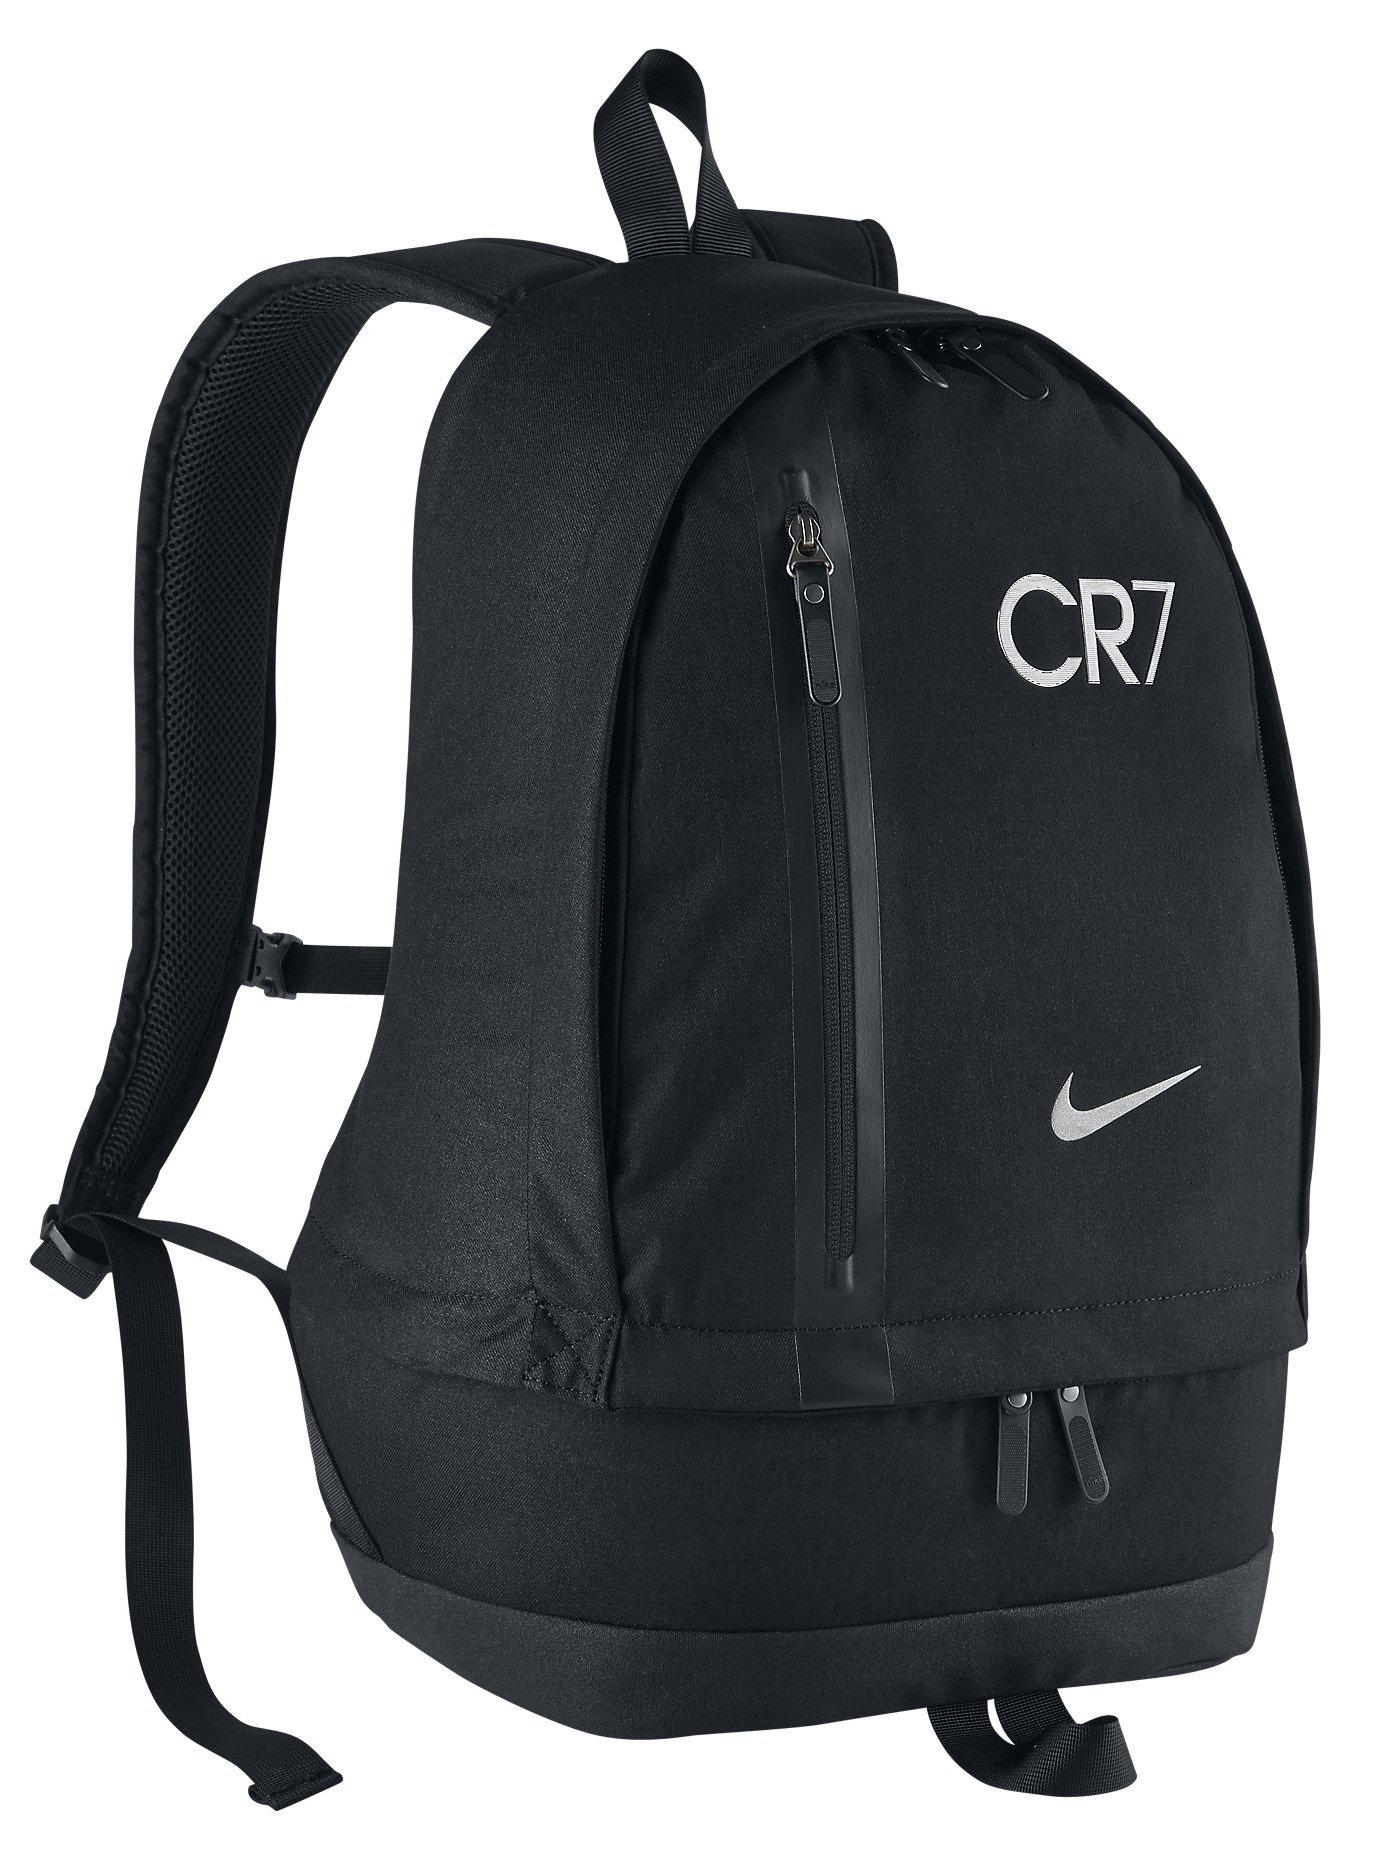 Batoh Nike Cheyenne CR7